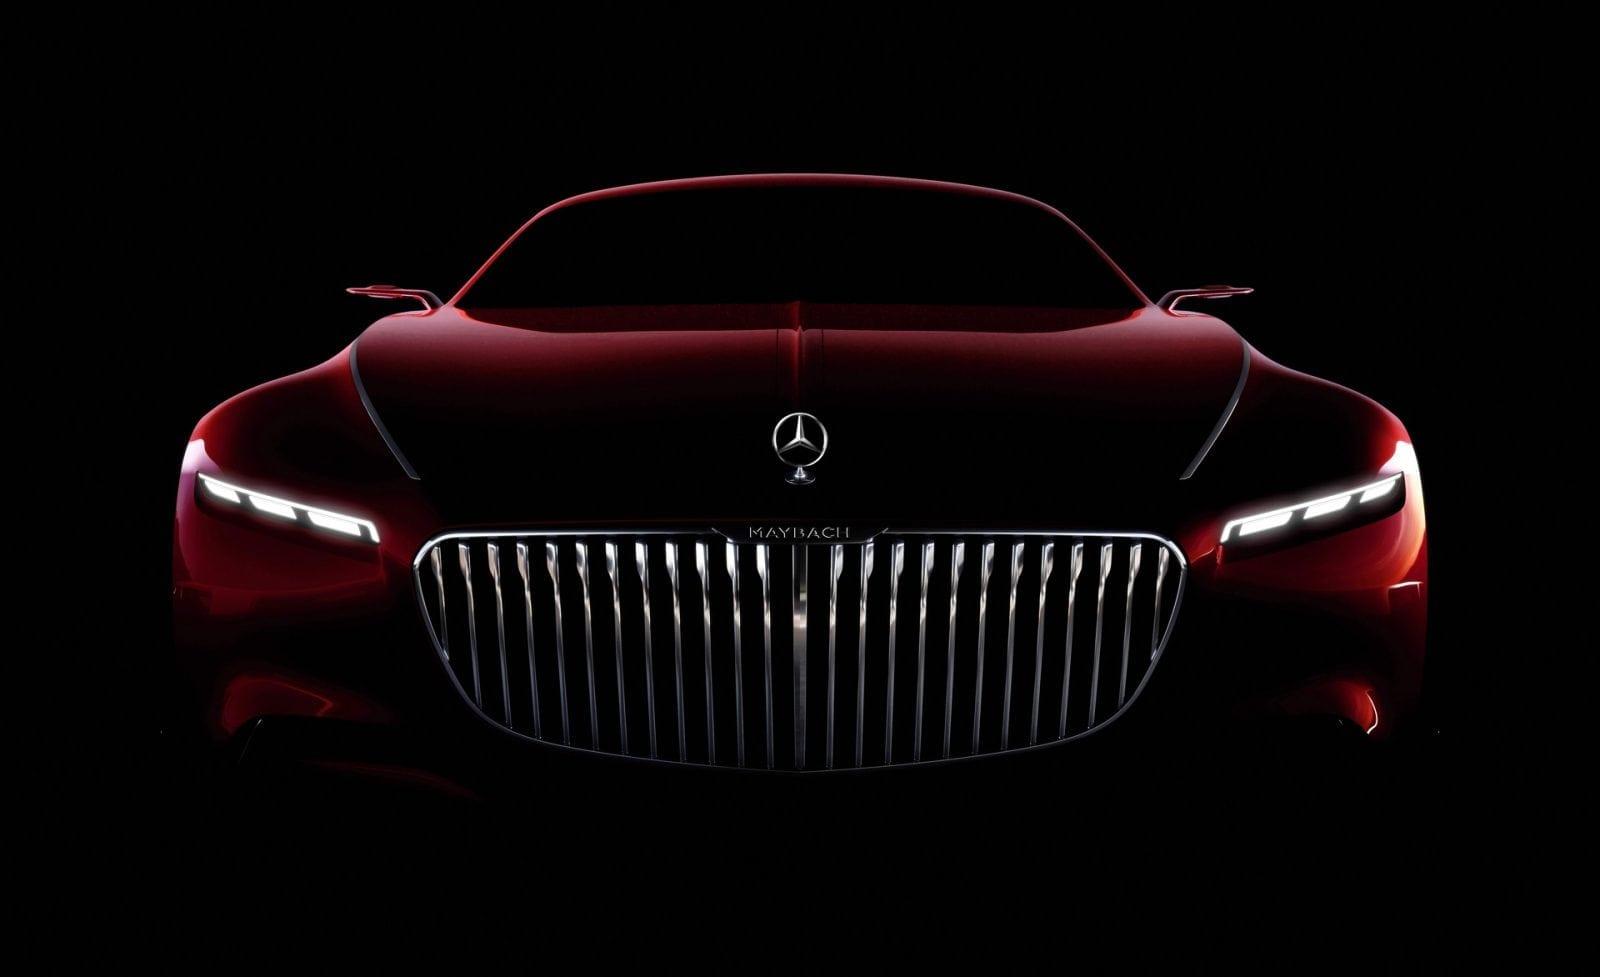 Mercedes maybach coupe teaser front - Șase metri de lux și opulență - Mercedes-Maybach